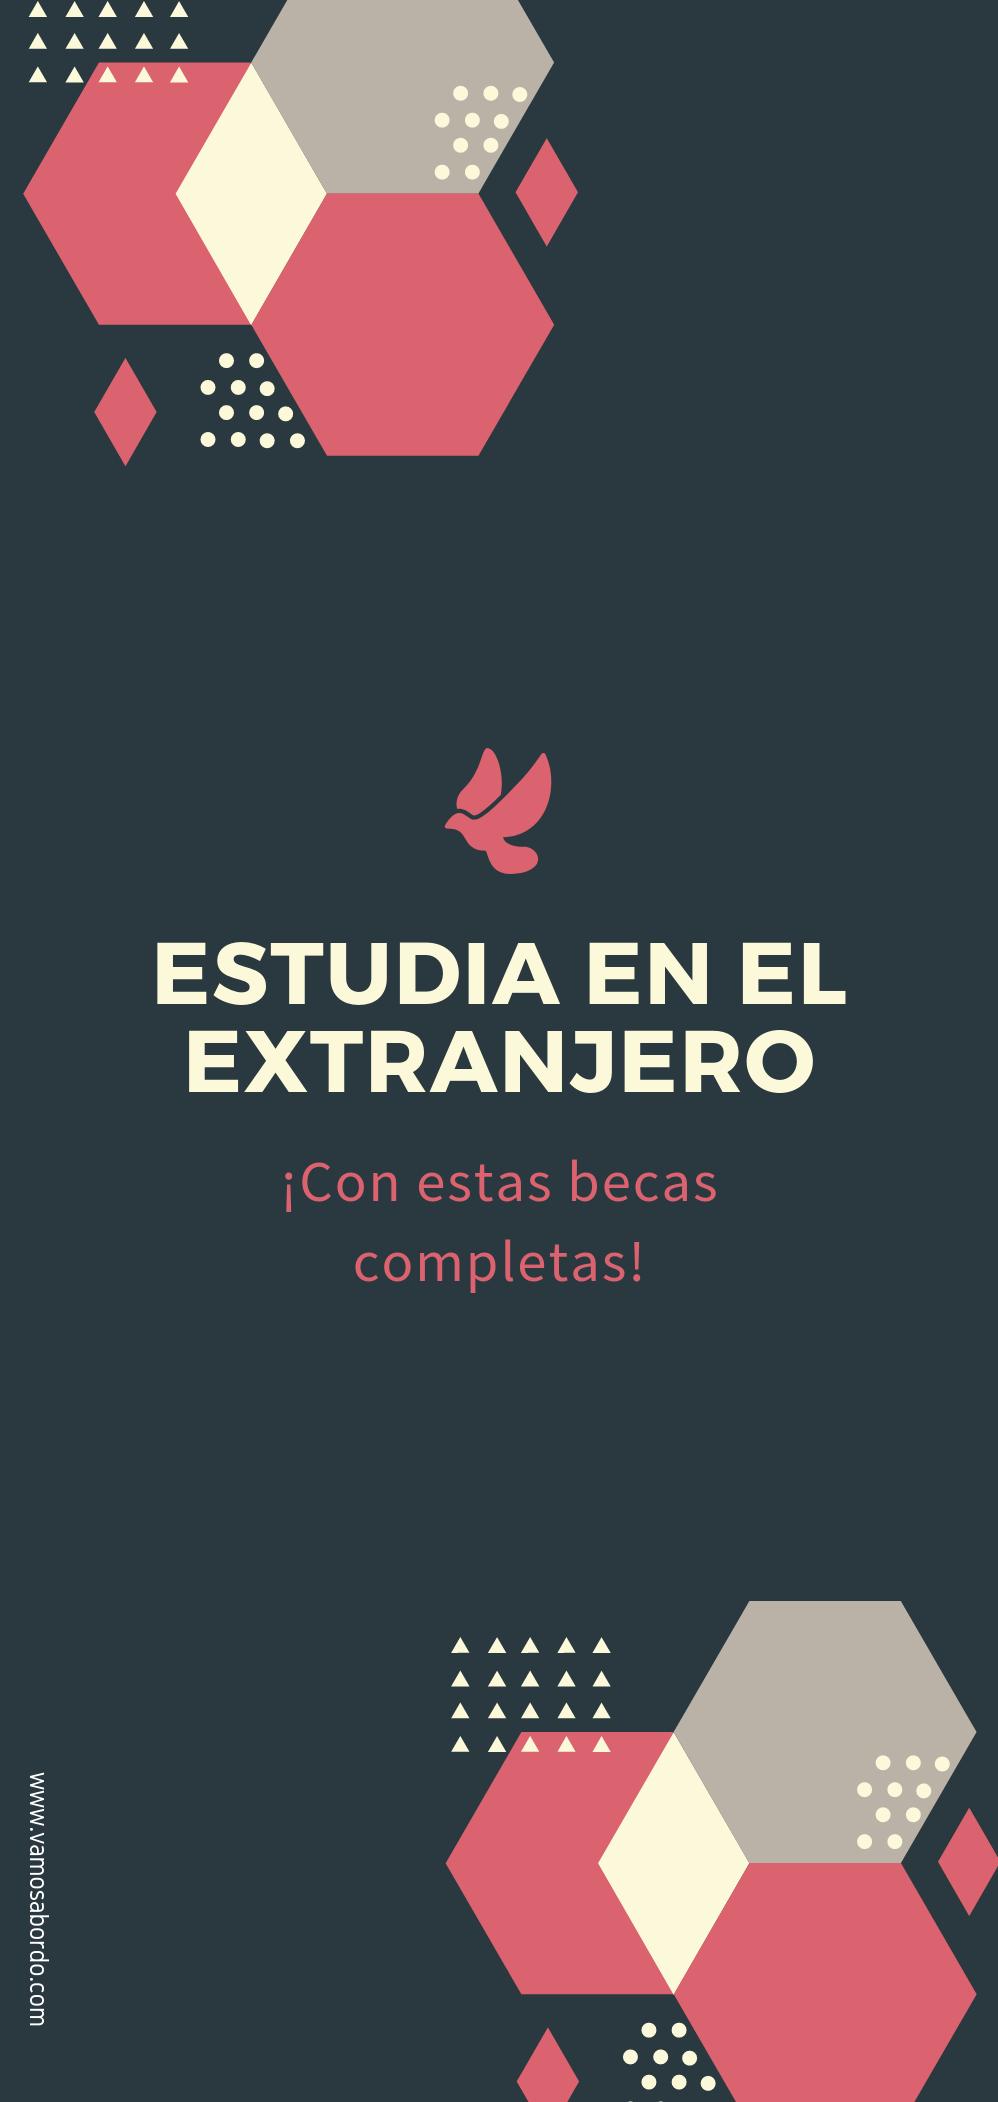 Becas Para Latinoamericanos 2021 Guía Oficial Vamos A Bordo Cartas De Motivacion Carreras Para Estudiar Becas Universitarias